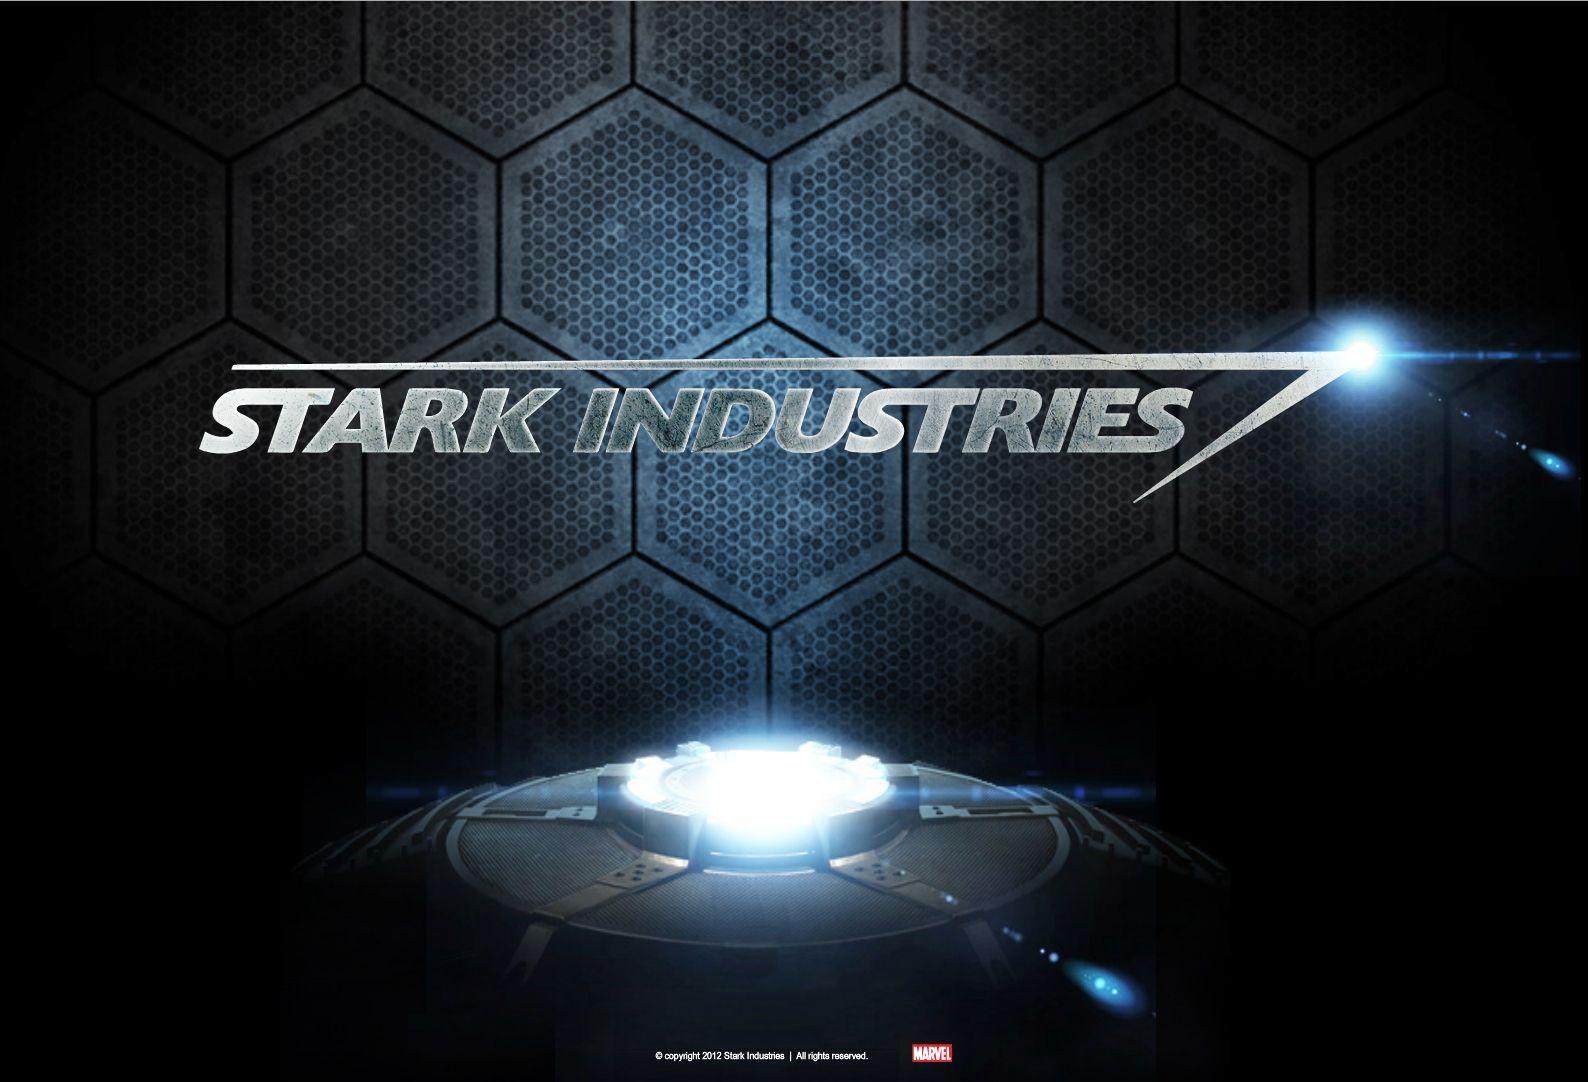 Iron Man Stark Industries Hd Wallpapers Wallpaper Cave